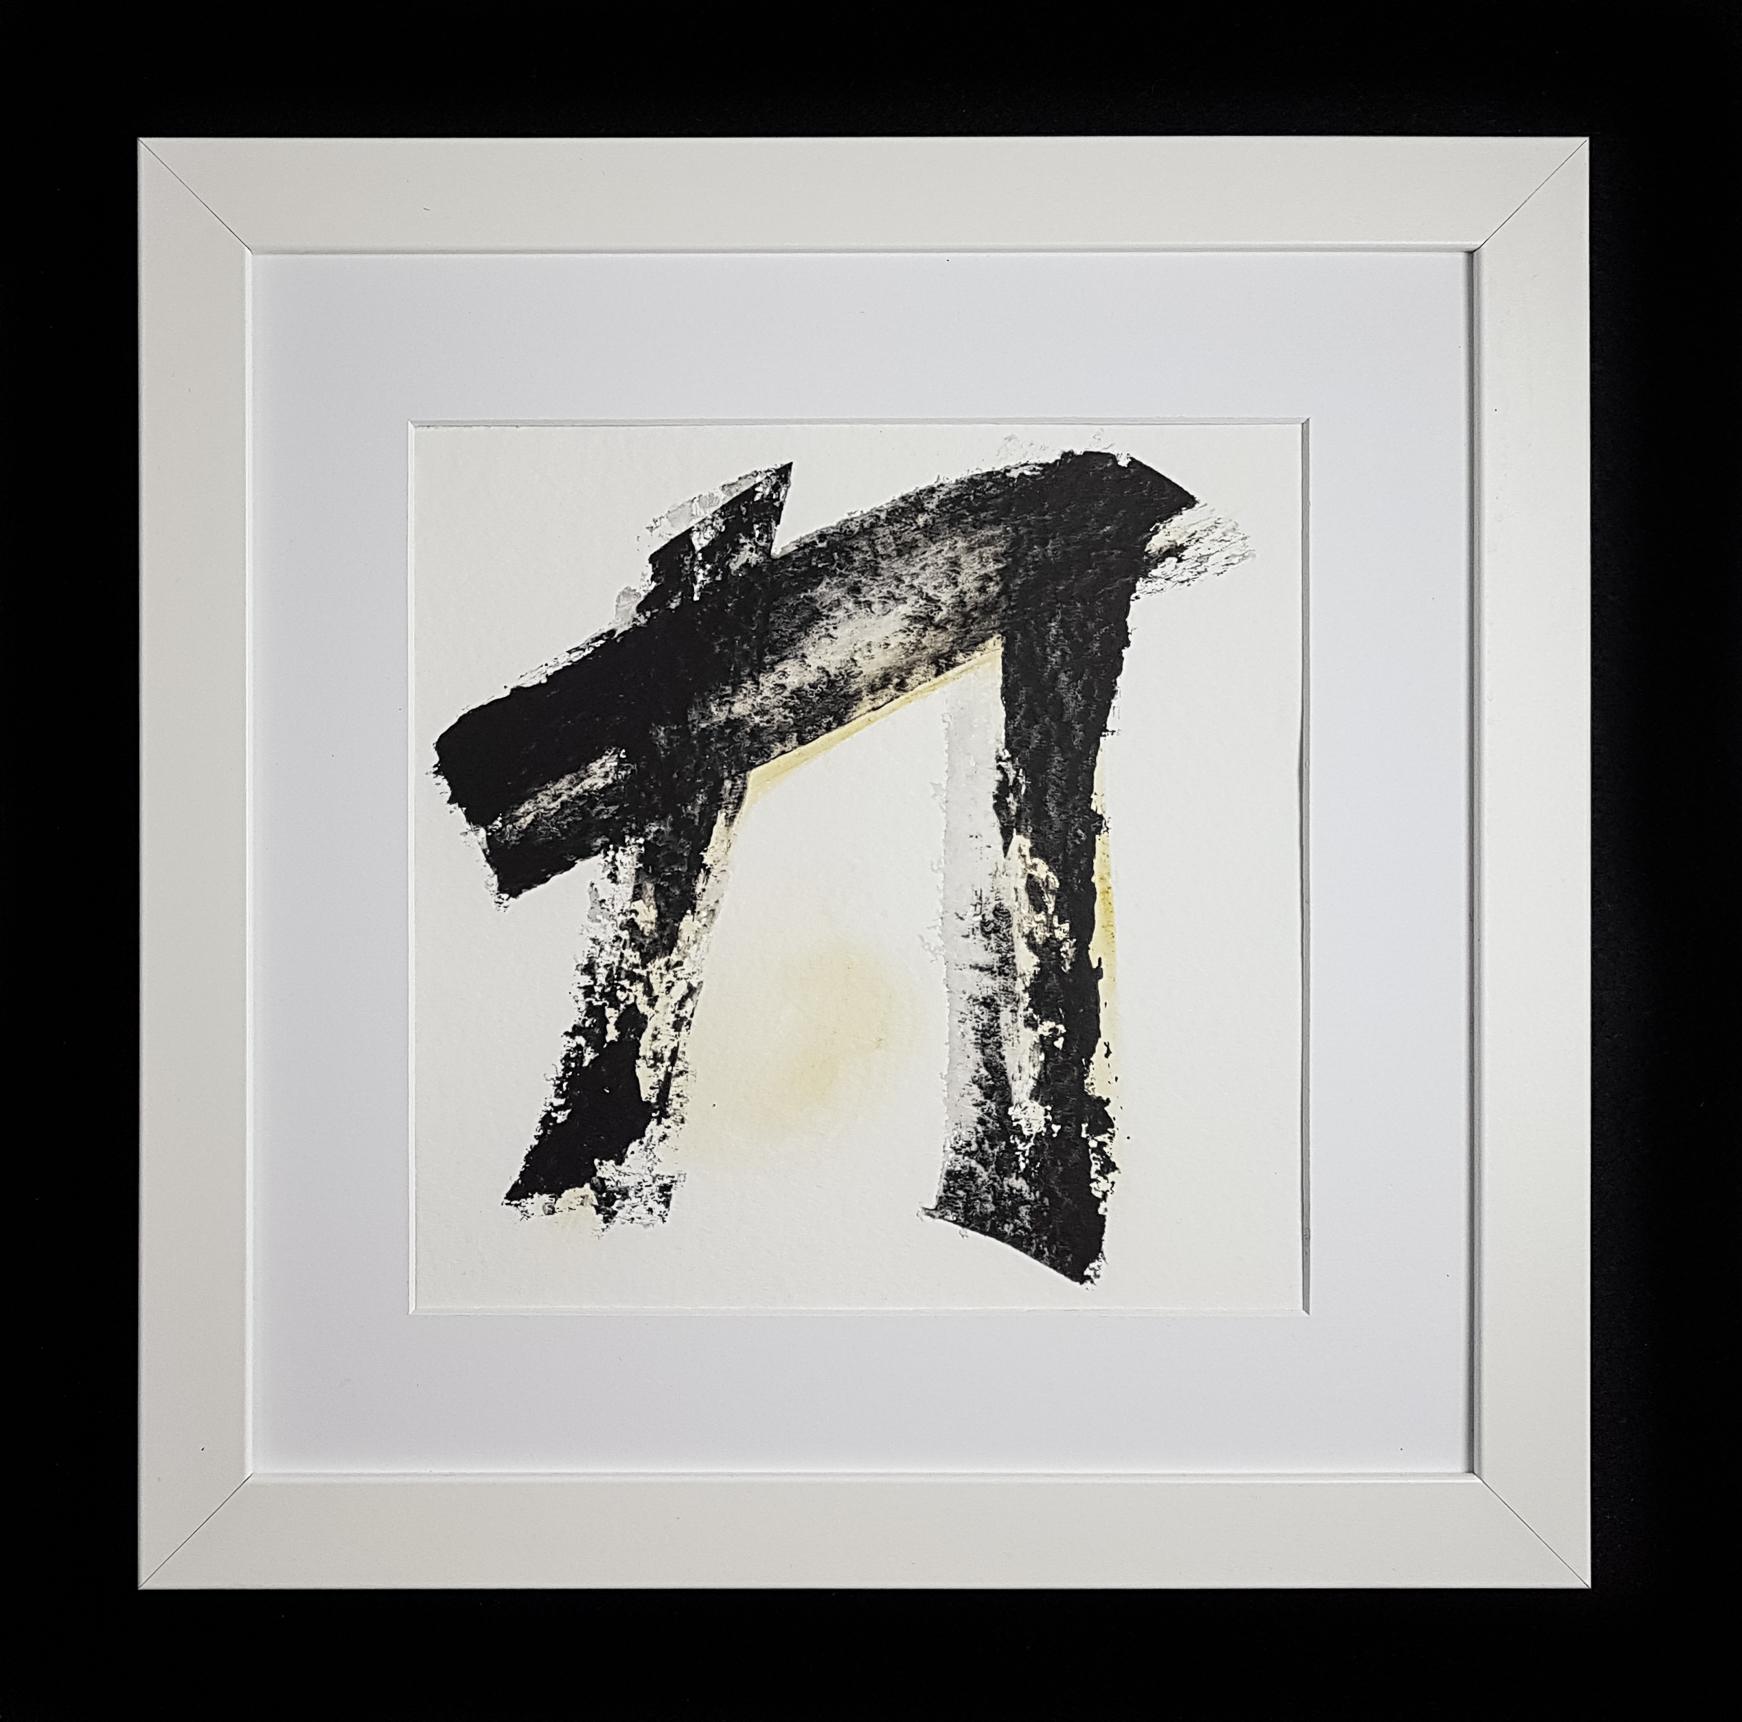 Matthew G. Beall Asemic Squared 25 x 25 cm 2017 (3)